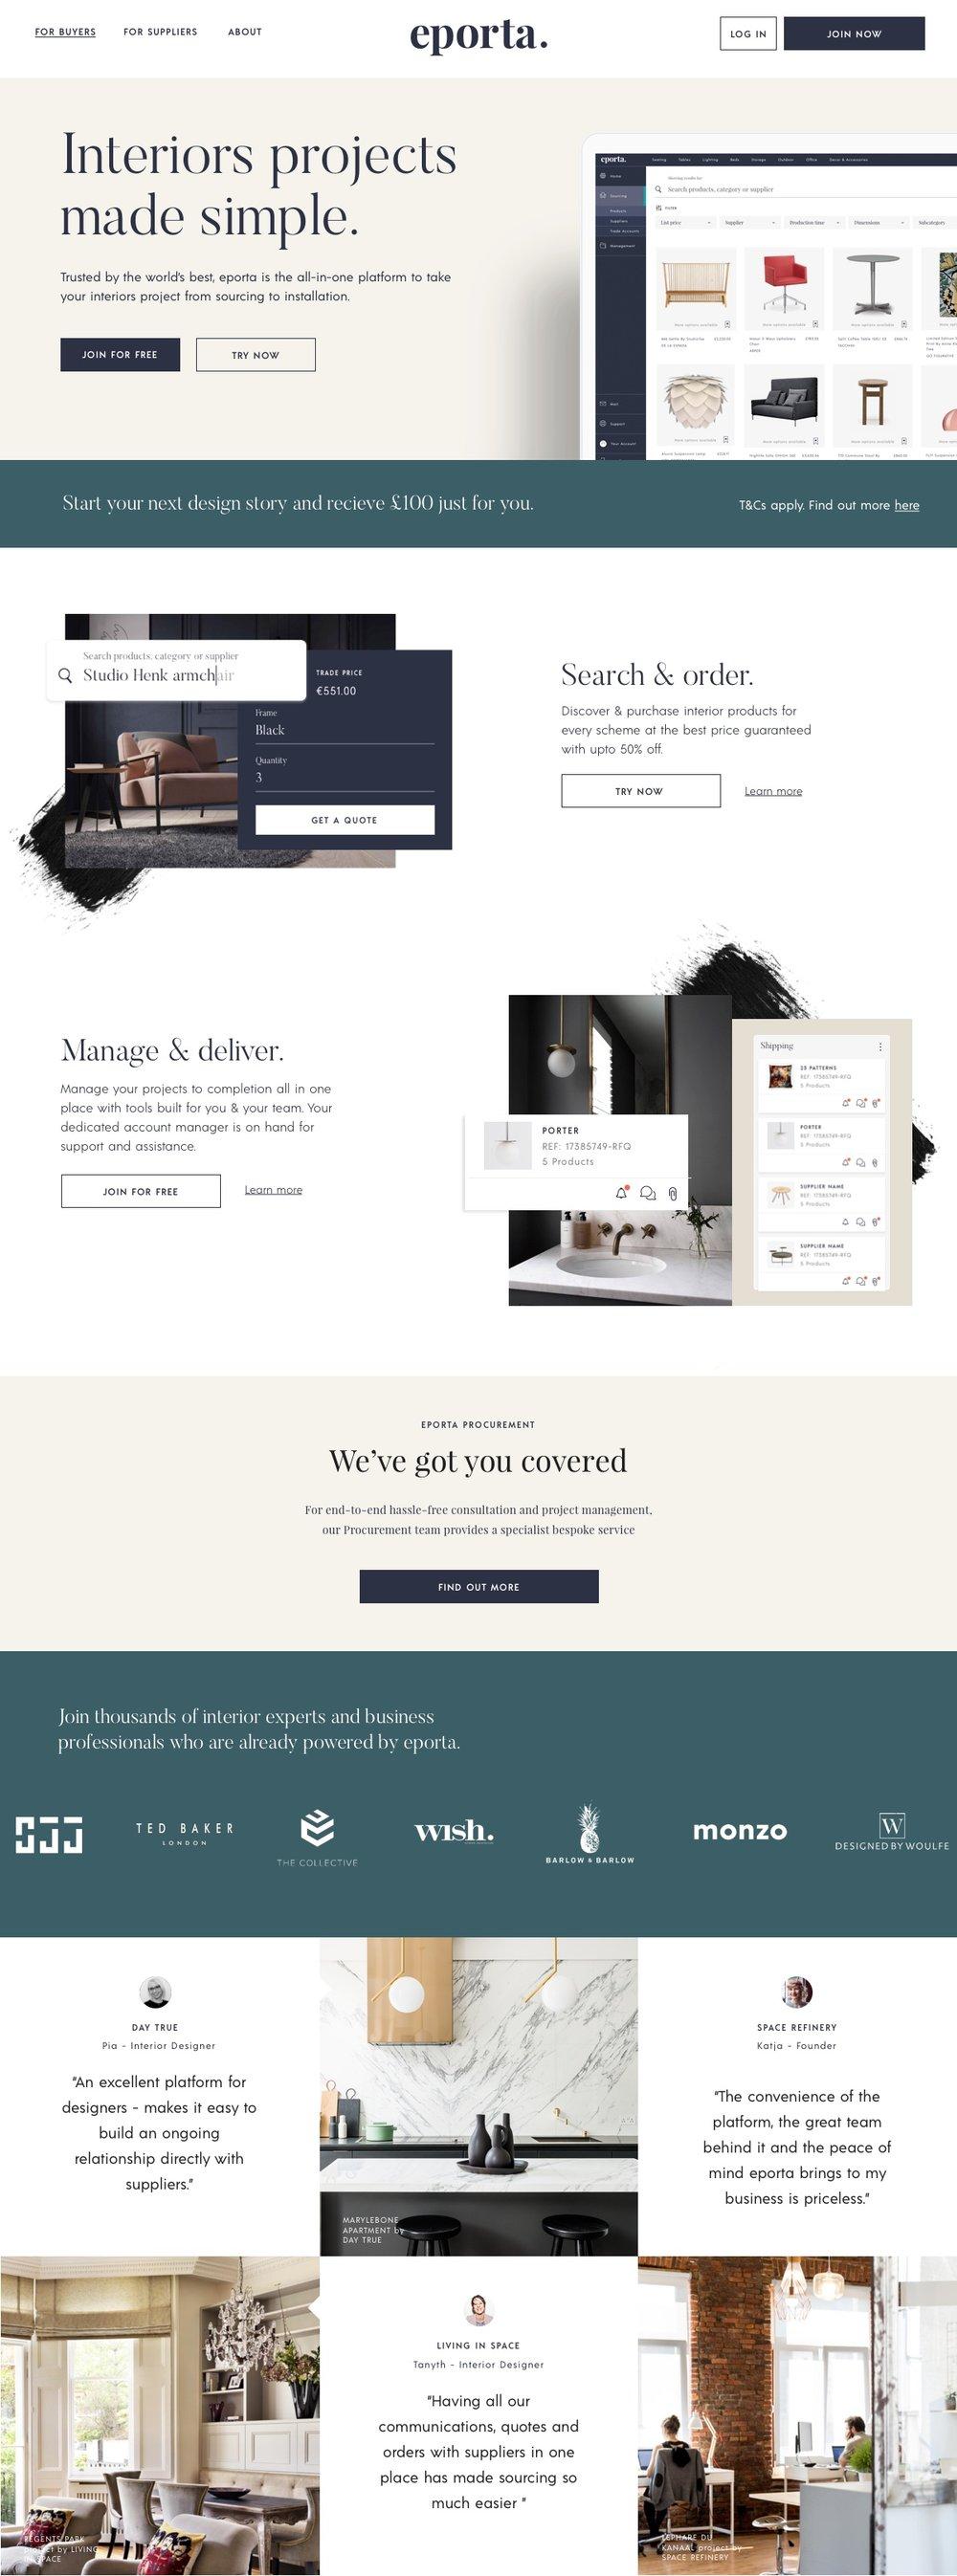 eporta website design